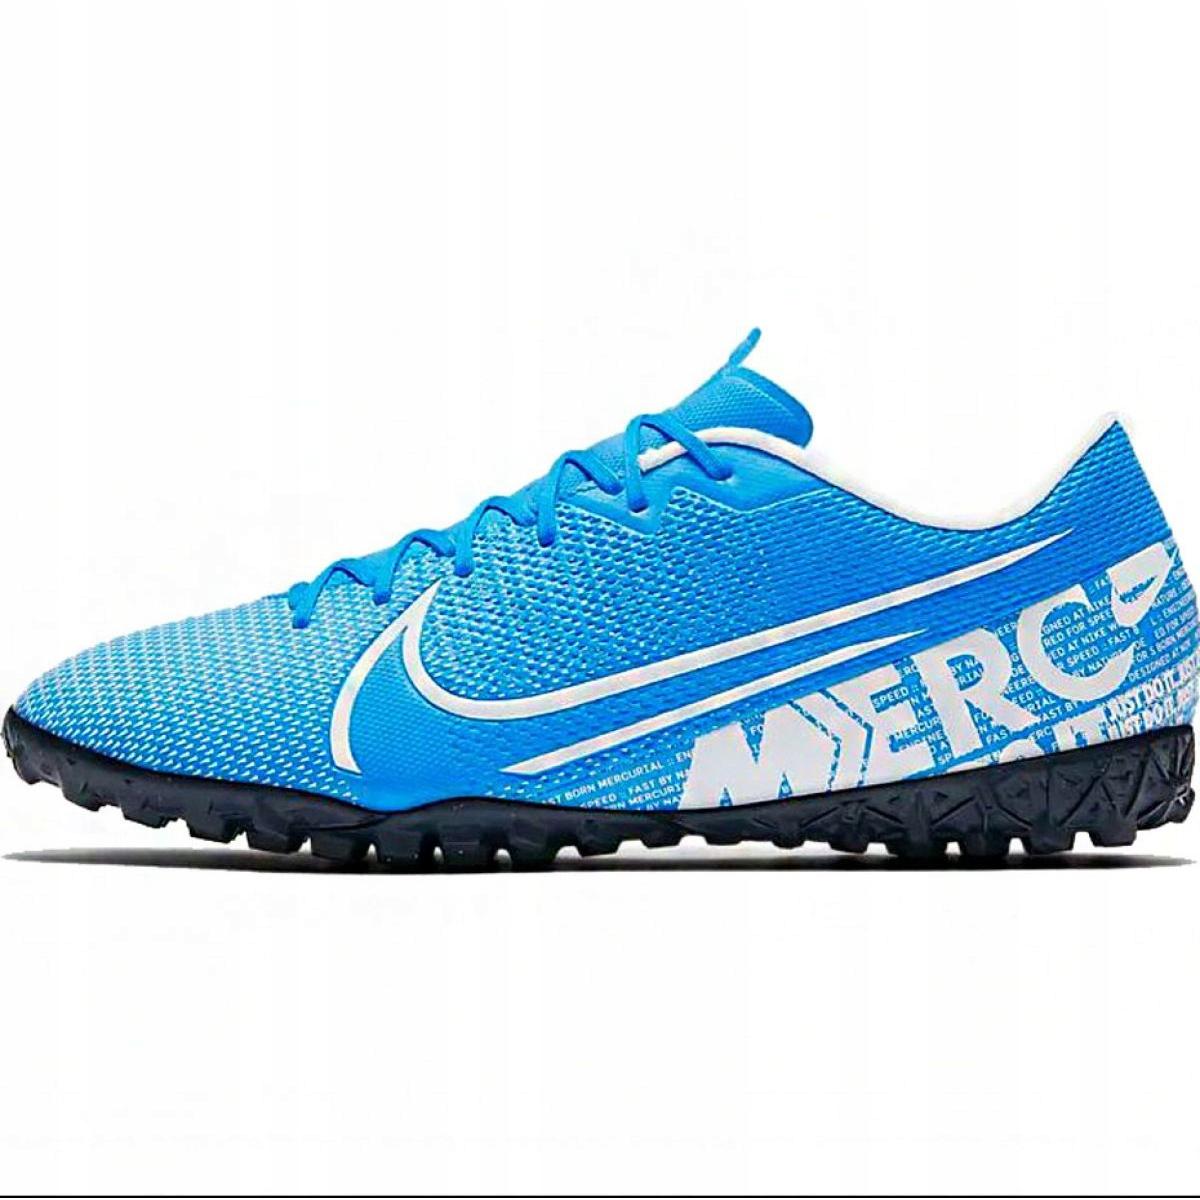 Chuteiras de futebol Nike Mercurial Vapor 13 Academy M Tf AT7996 414 azul branco, azul